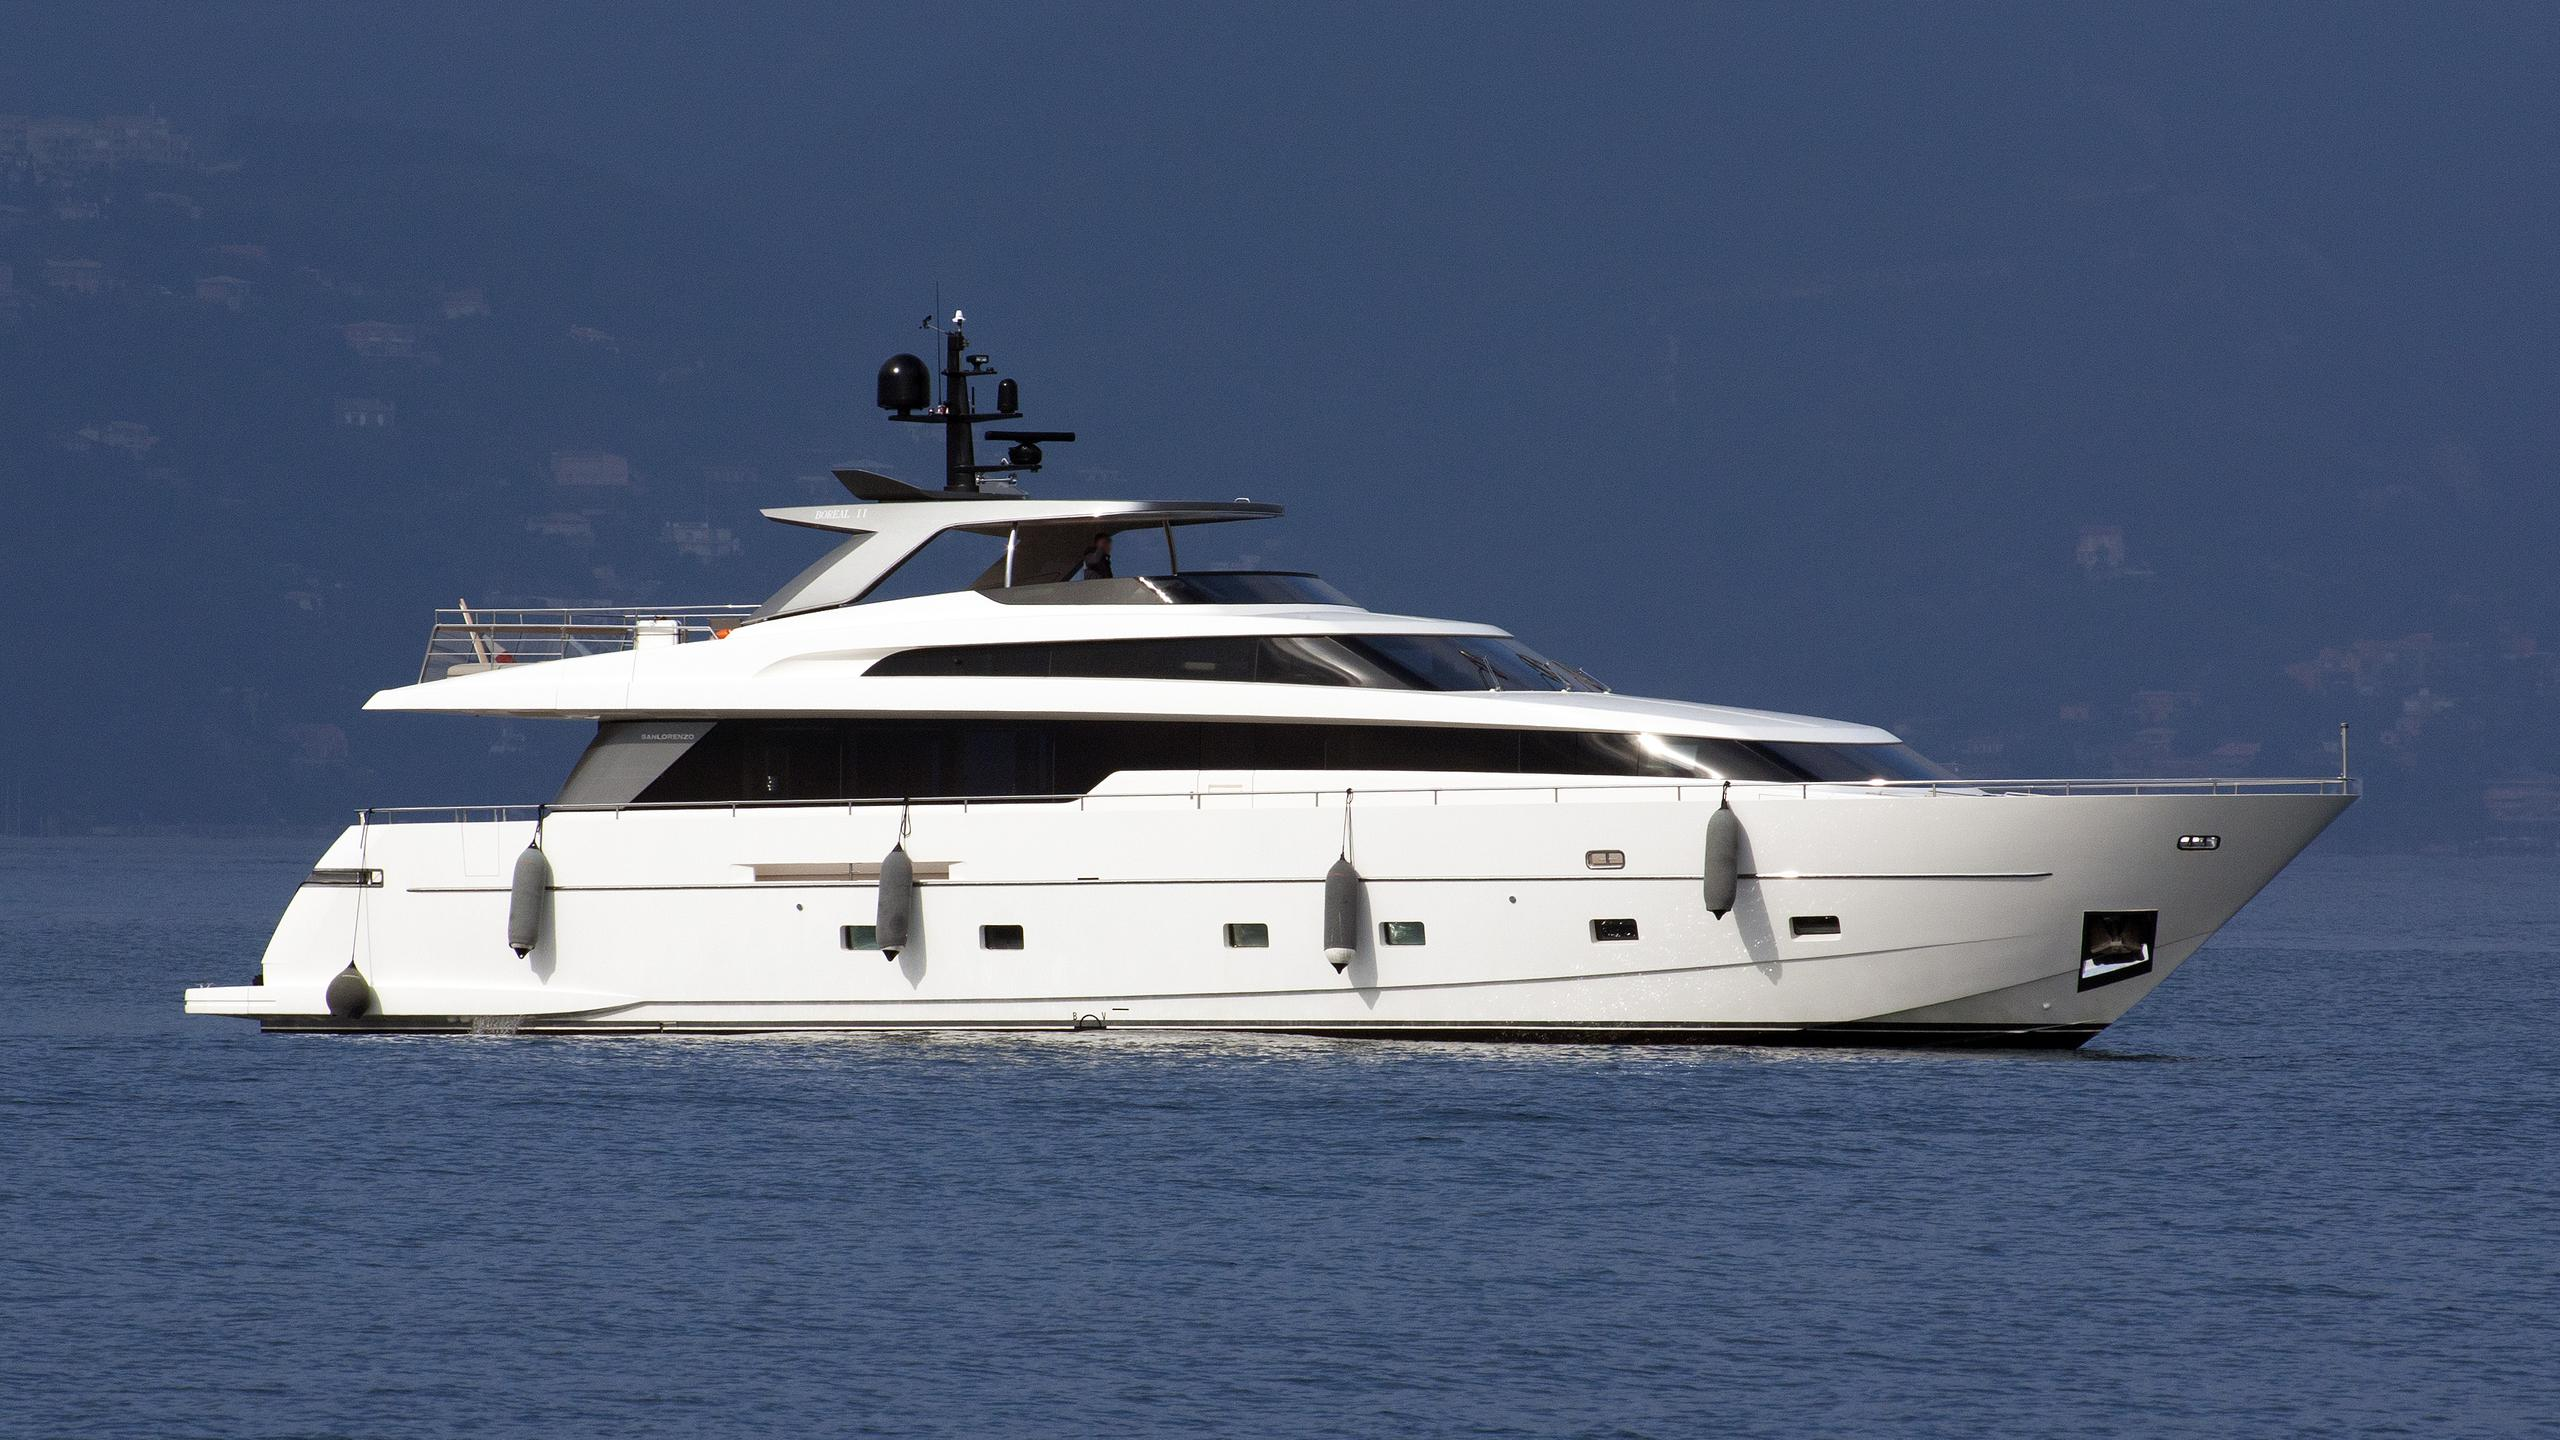 hemabejo boreal ii motoryacht sanlorenzo sl94 2012 29m profile